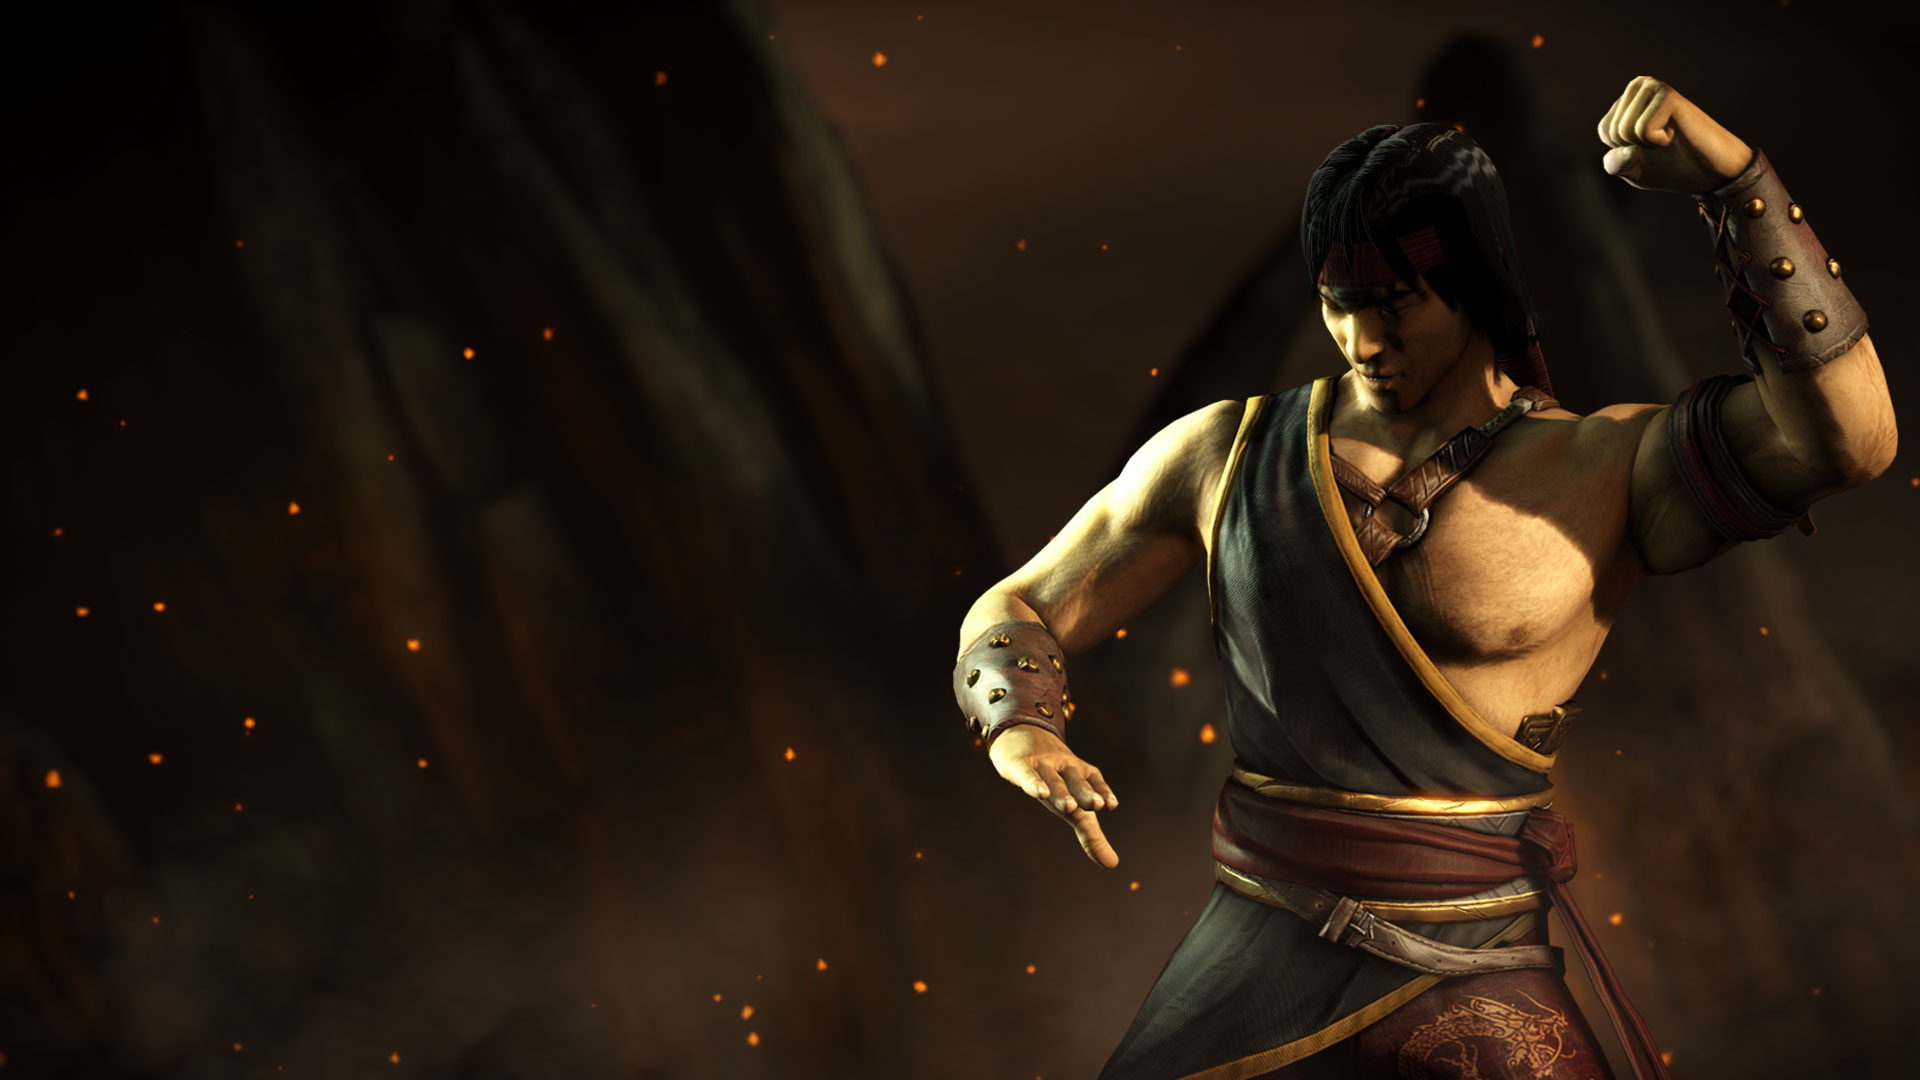 Hd Wallpaper Pack Mkwarehouse Mortal Kombat X Liu Kang